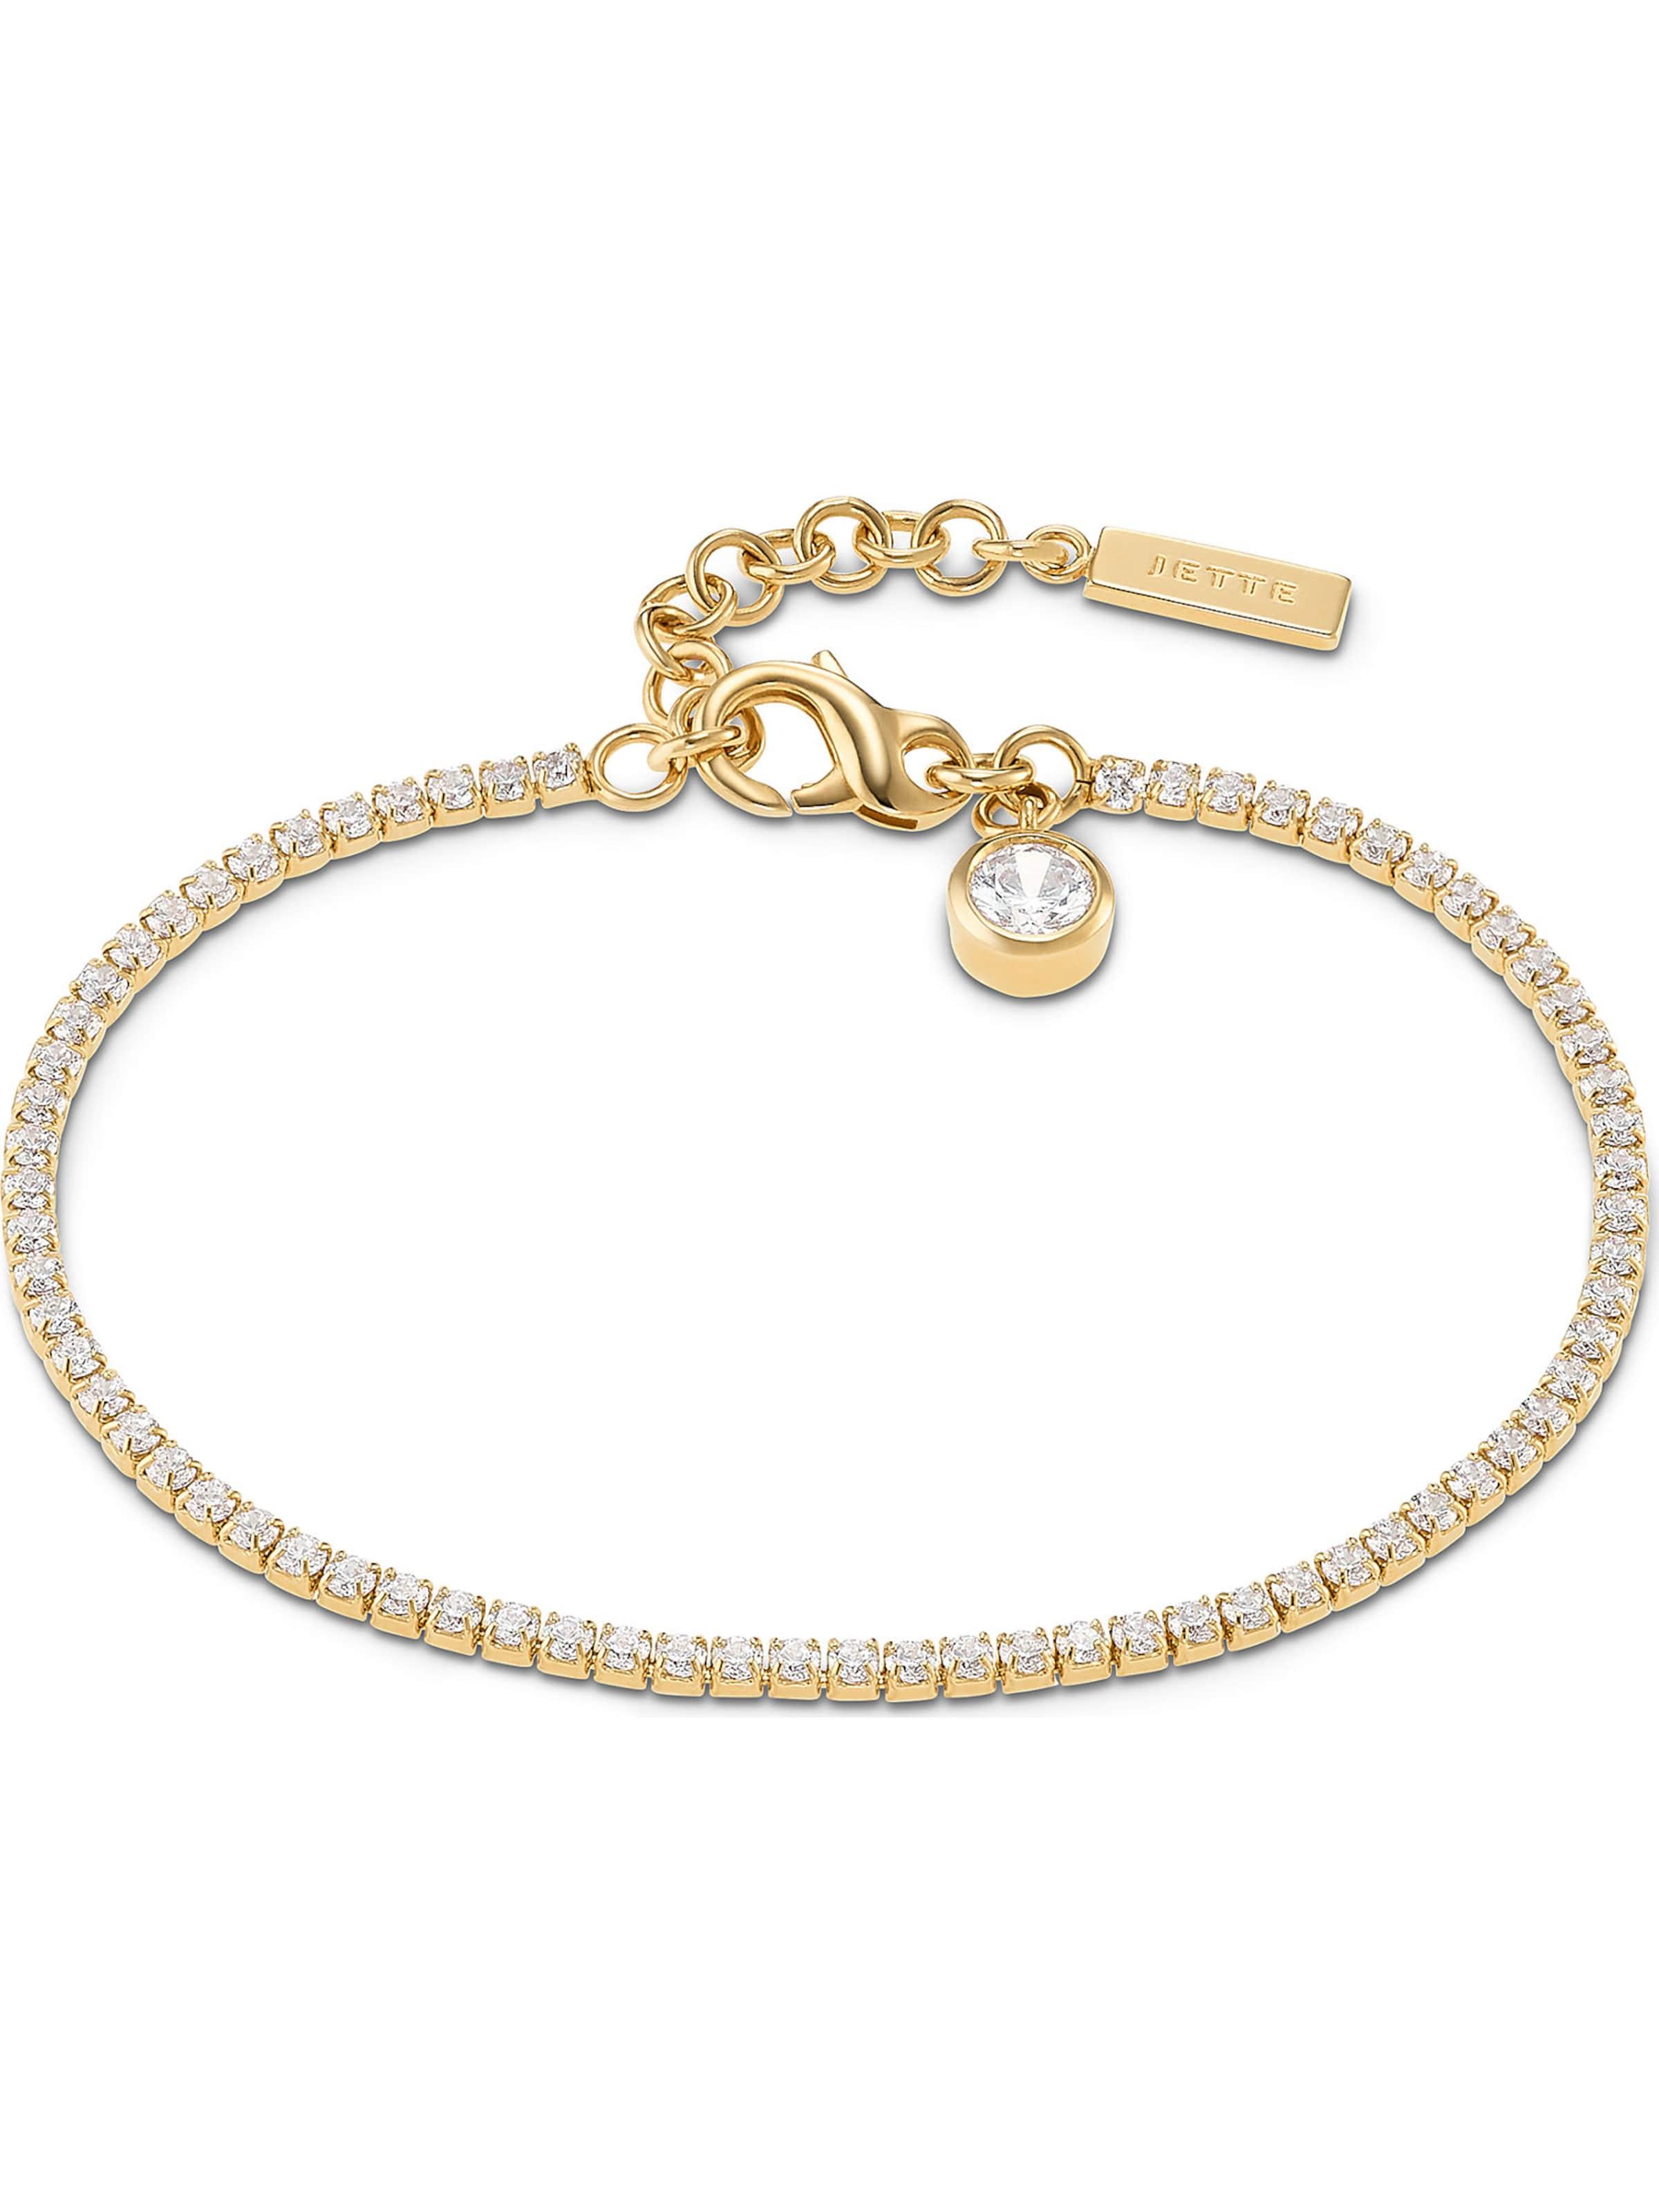 Armband In GoldTransparent Jette In GoldTransparent In Jette Armband Jette Armband Armband GoldTransparent Jette ULqzGSMVjp